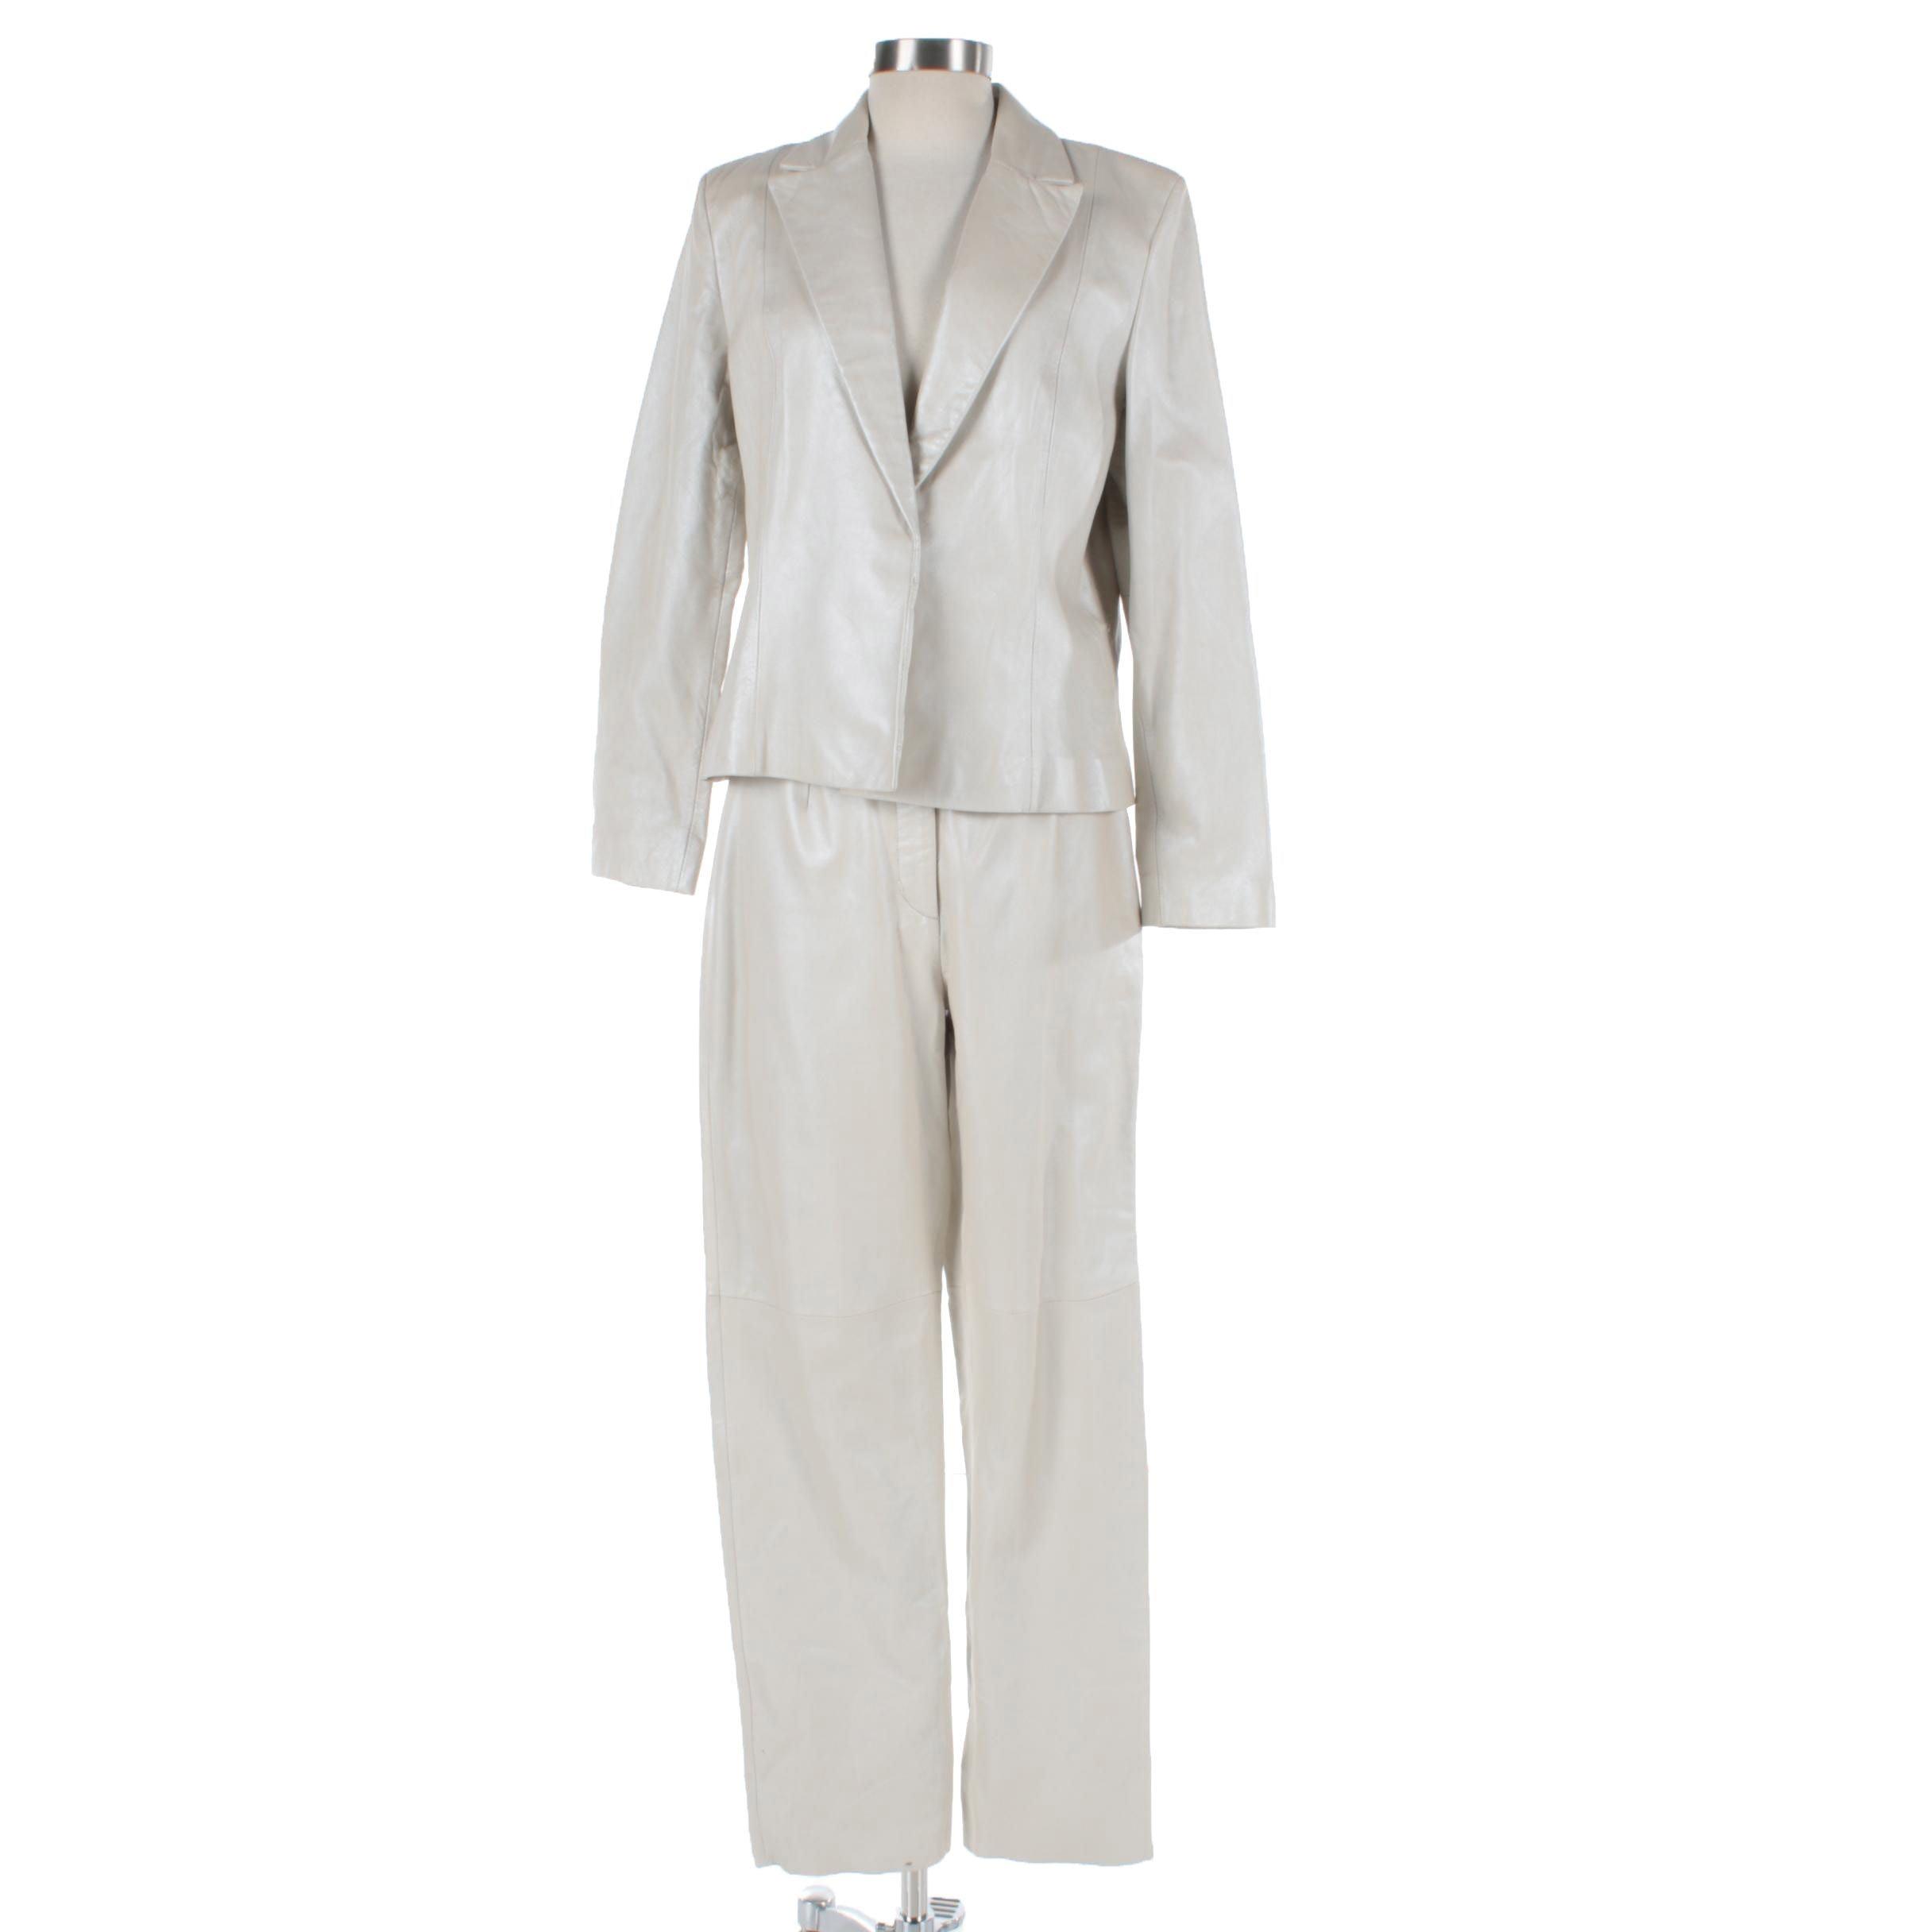 Siena Studio Pearl Sheen Ivory Leather Pantsuit